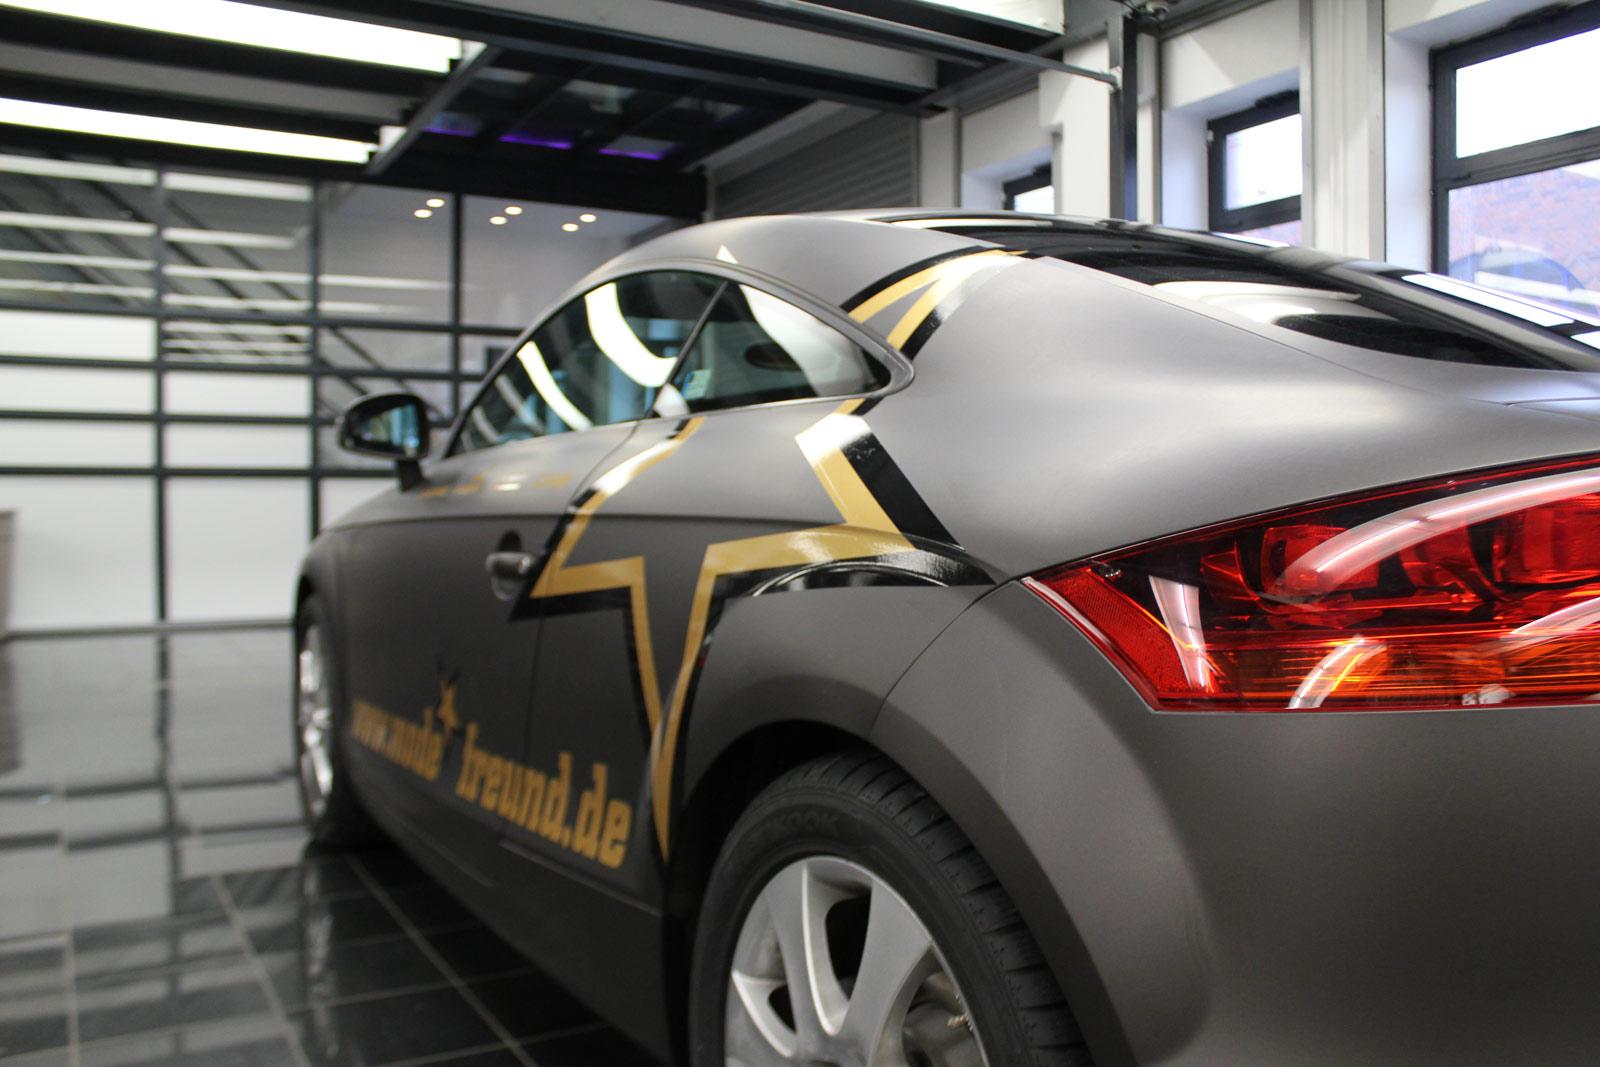 Audi_TT_Braun_Matt_Metallic_Branding_18